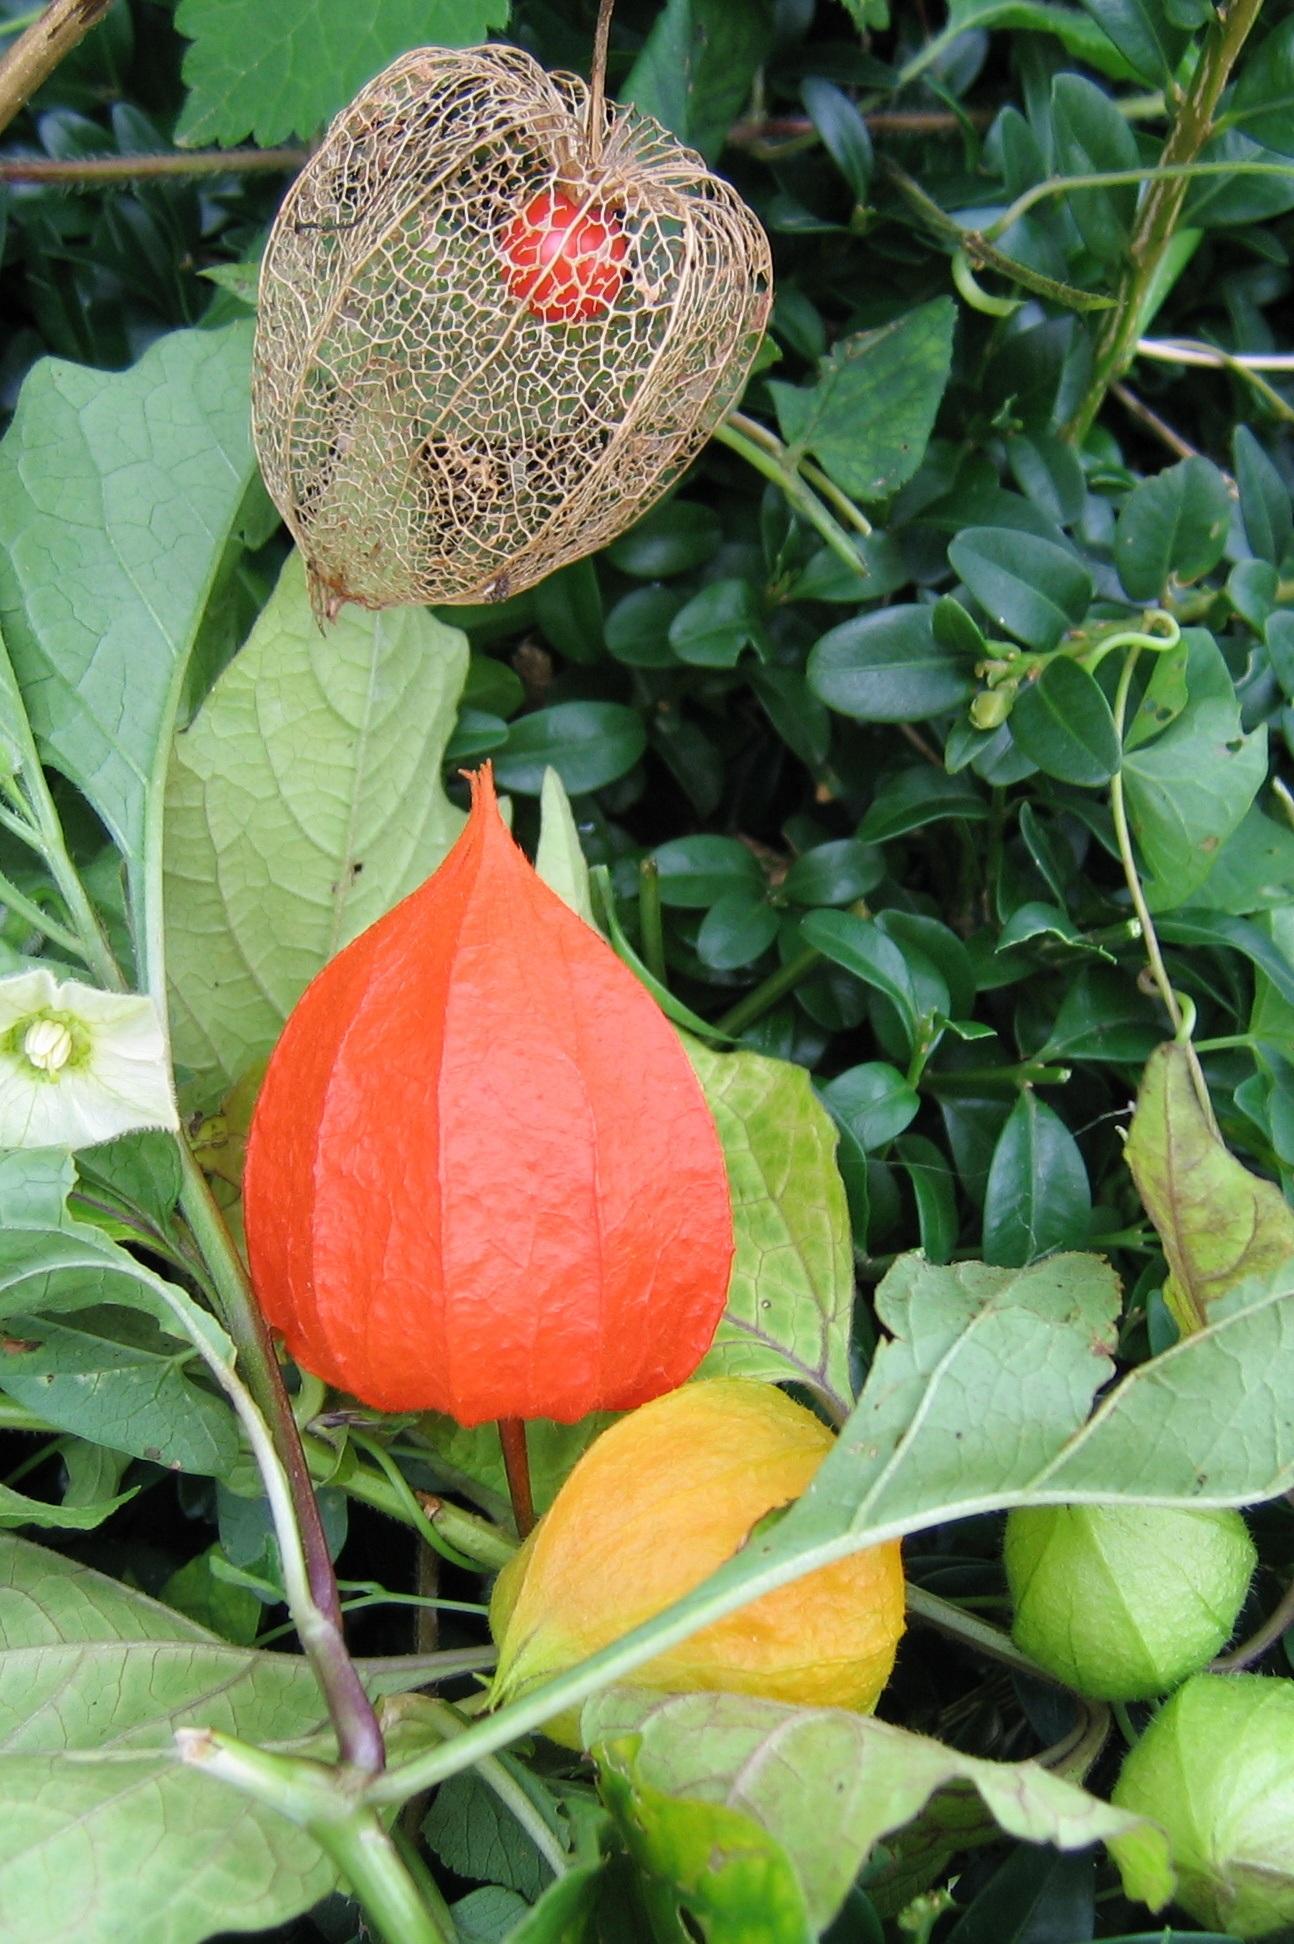 Fotos gratis : Fruta, hoja, flor, vaso, naranja, comida, Produce ...